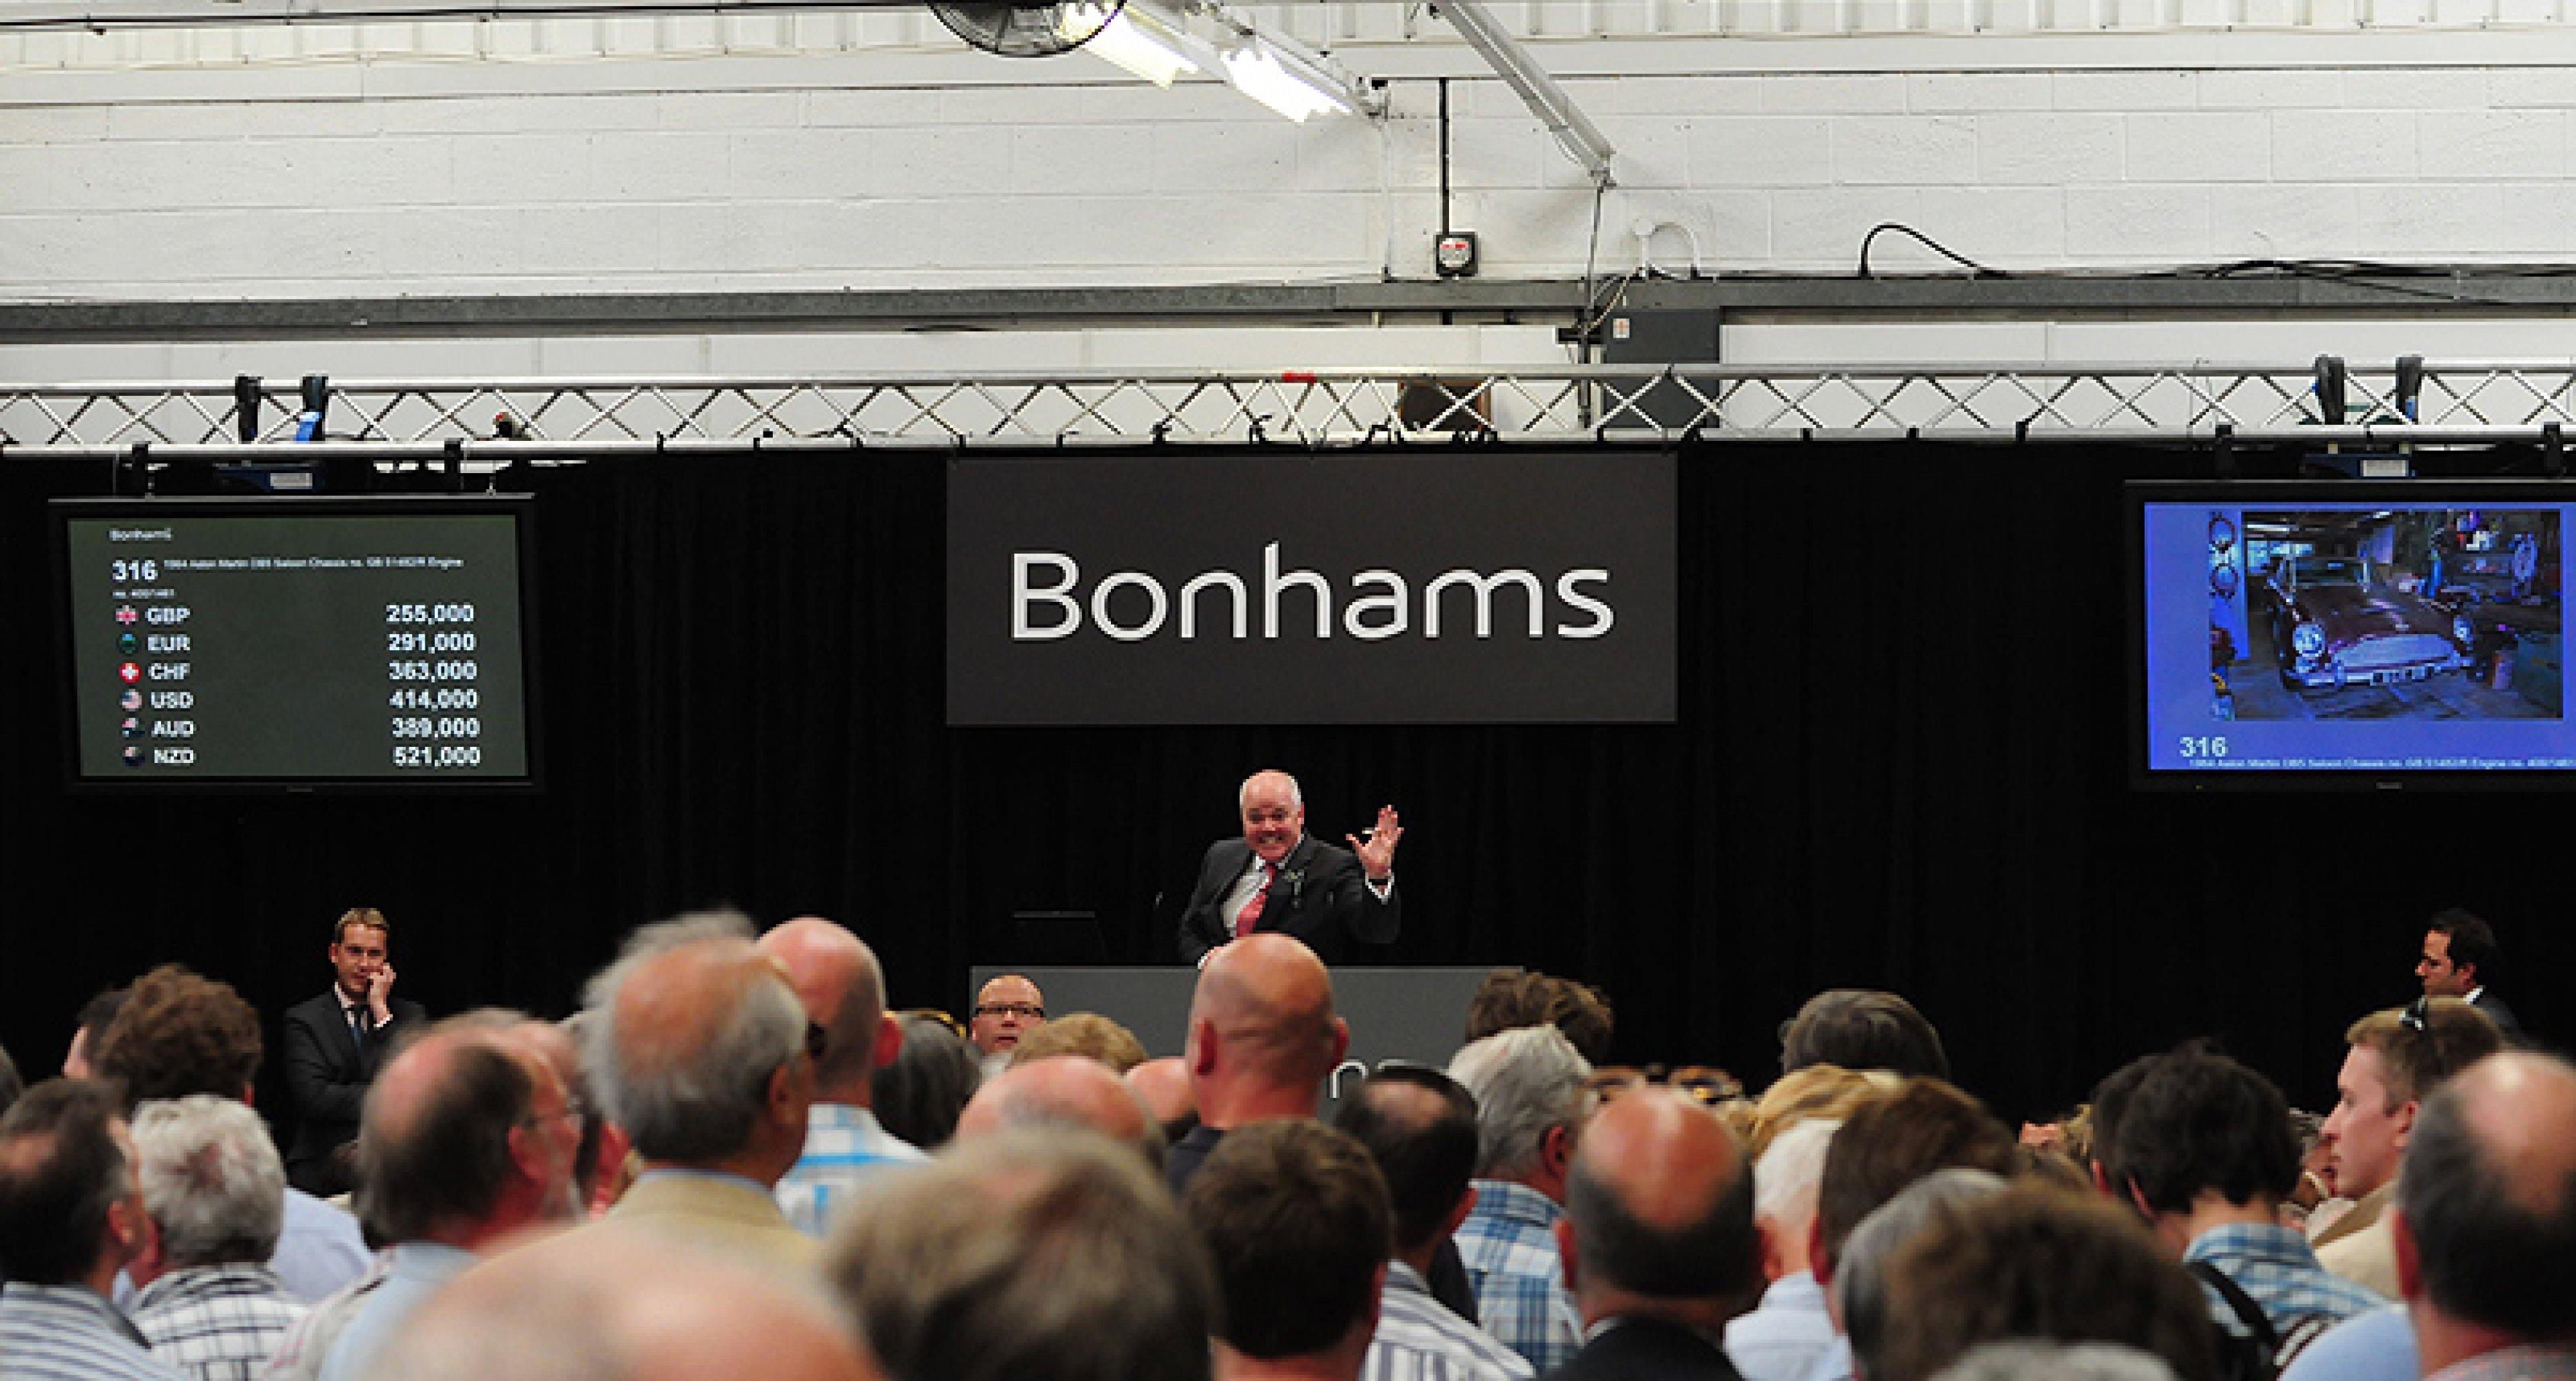 Bonhams Aston Martin Sale at Newport Pagnell  21 May 2011: Review